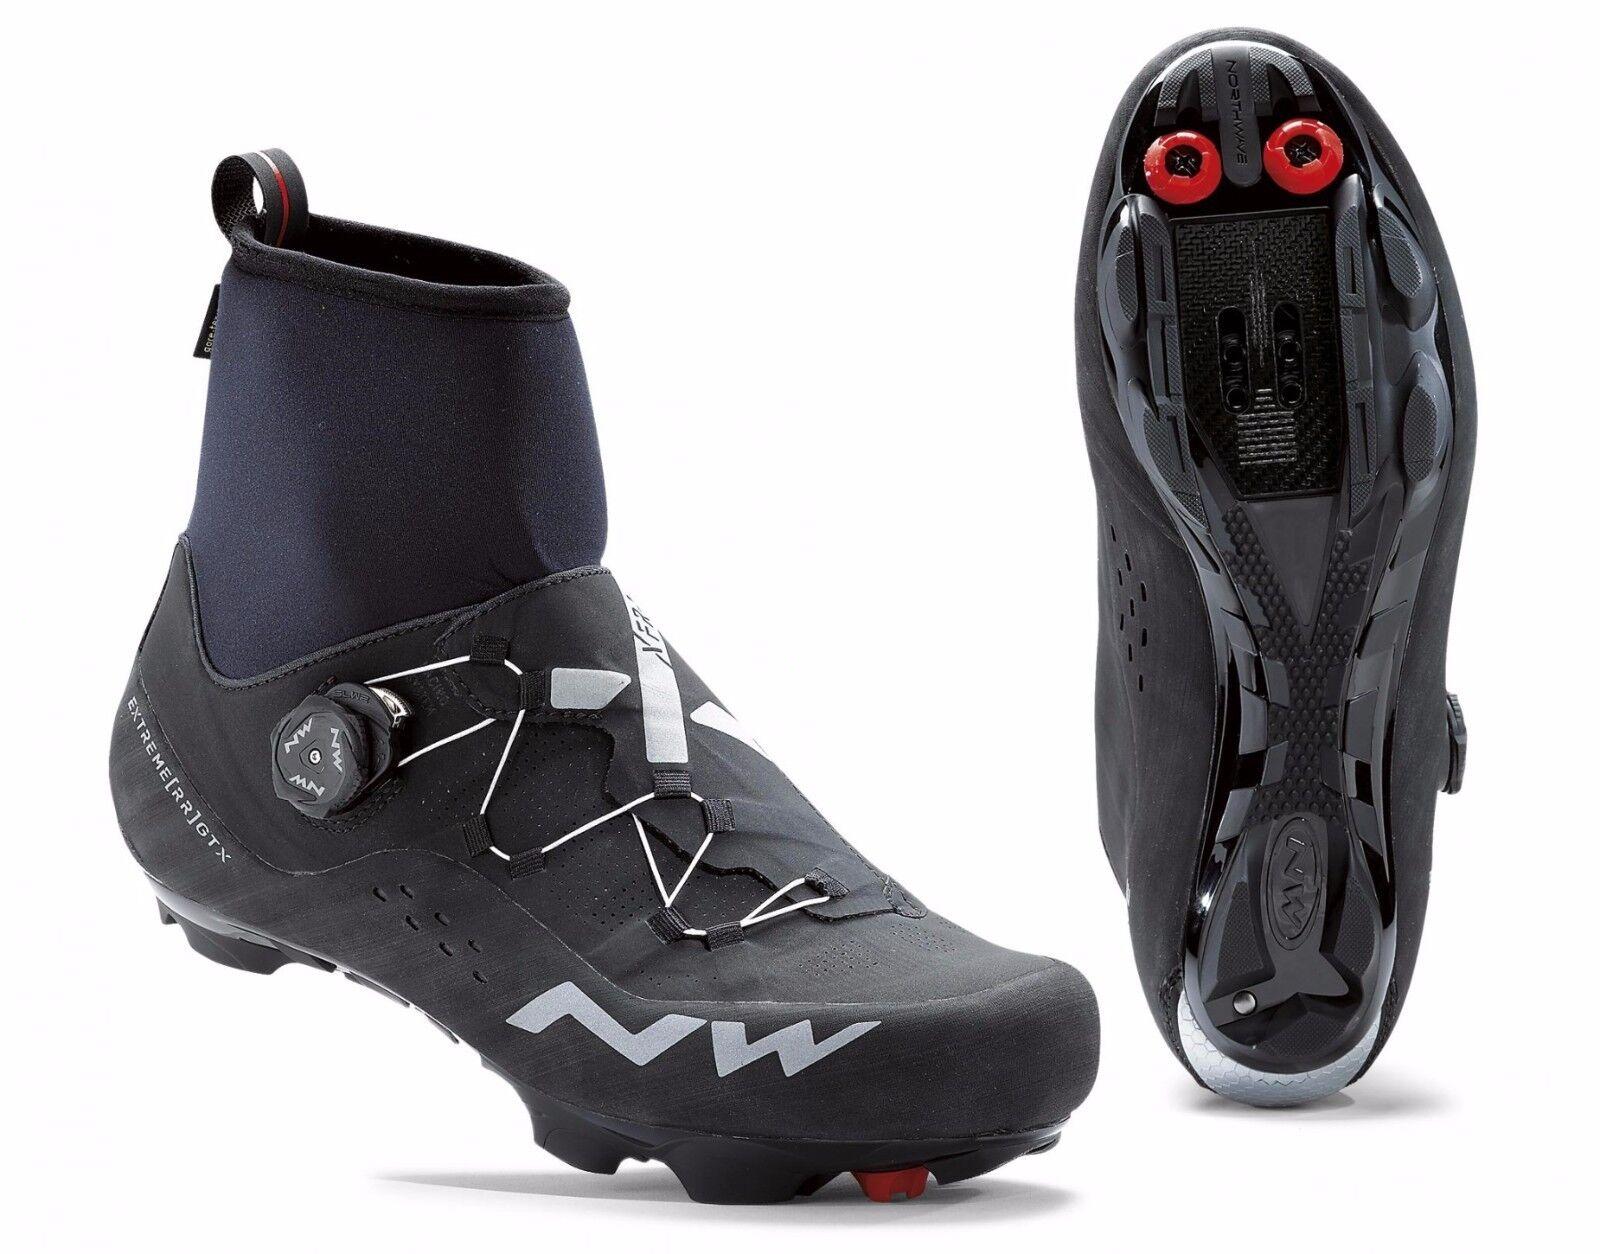 Schuhe NORTHWAVE EXTREME XCM XCM XCM GTX schwarz schuhe Northwave extreme XCM gtx schwarz 206051